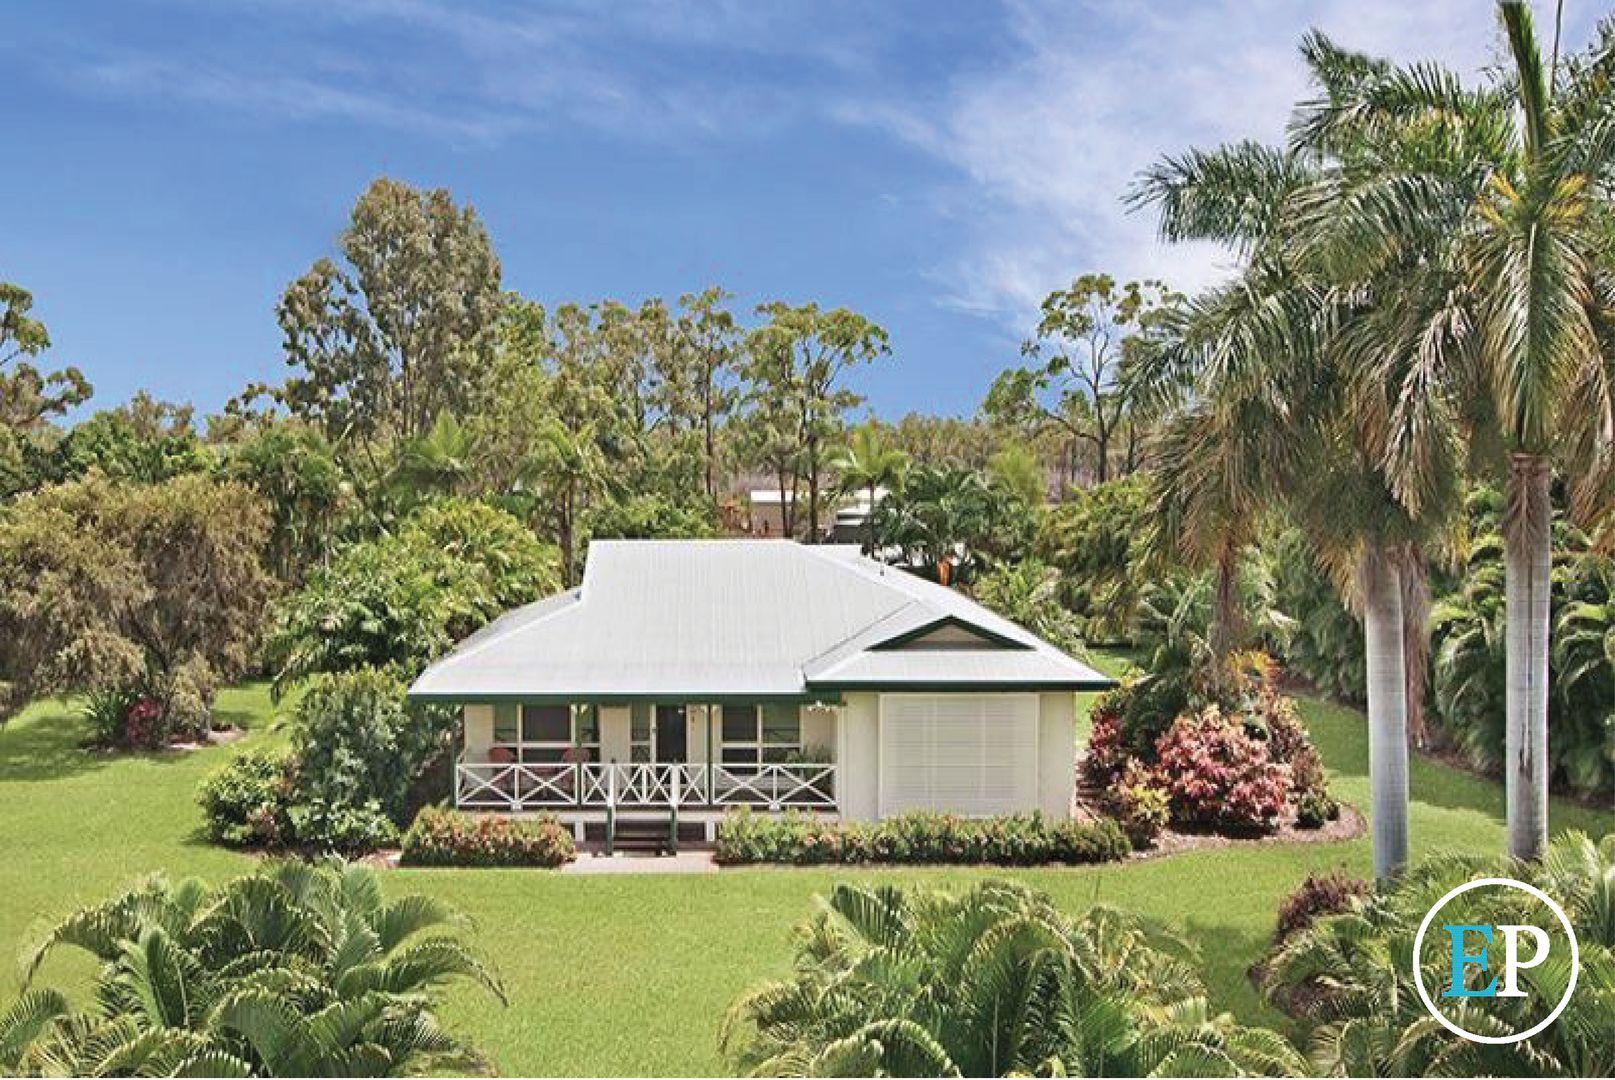 1 Benjamin Road, Rangewood QLD 4817, Image 0